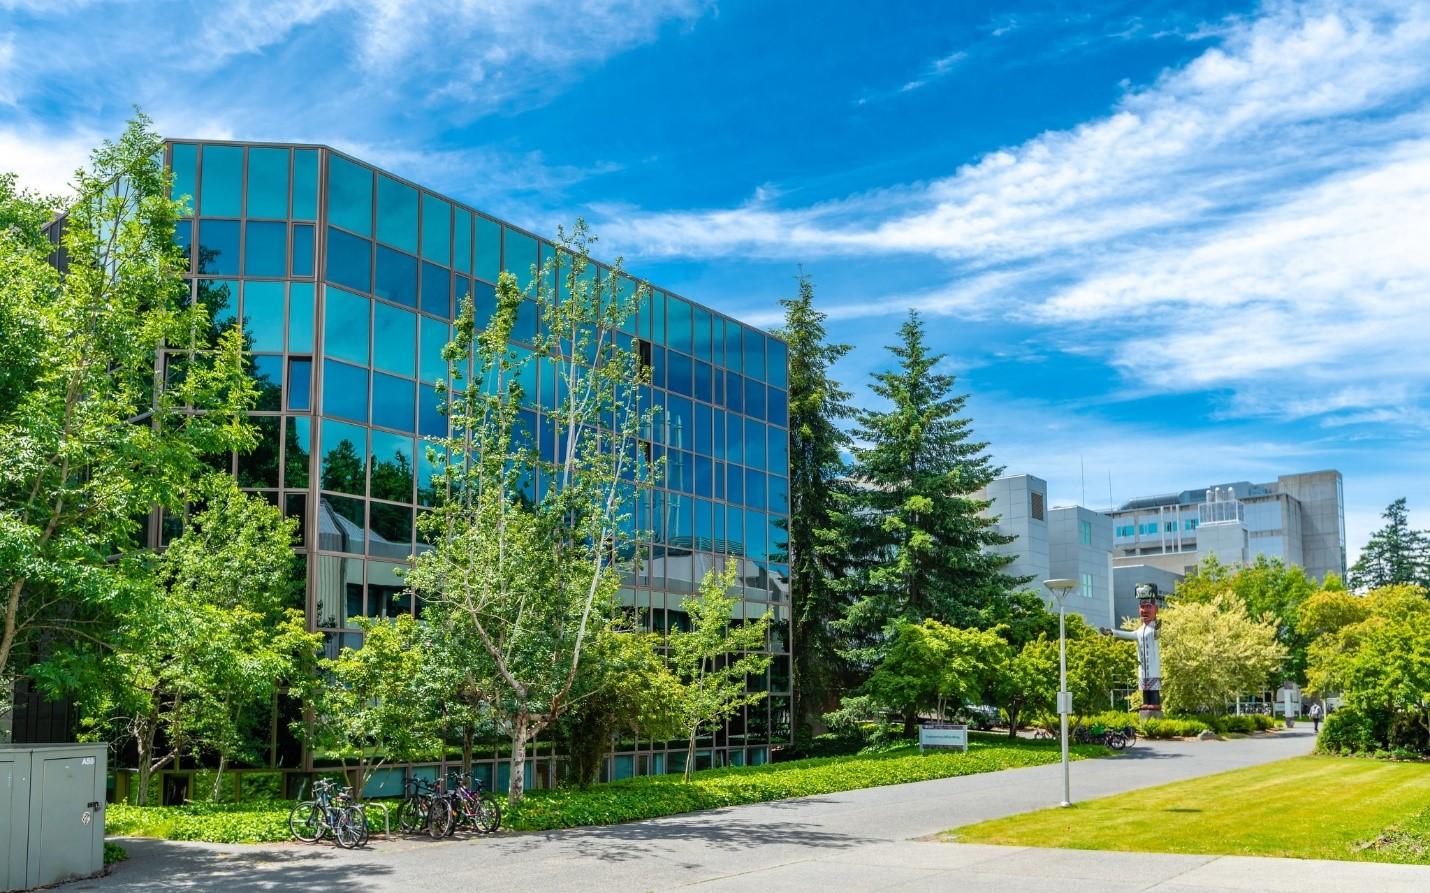 The University of Victoria engineering buildings